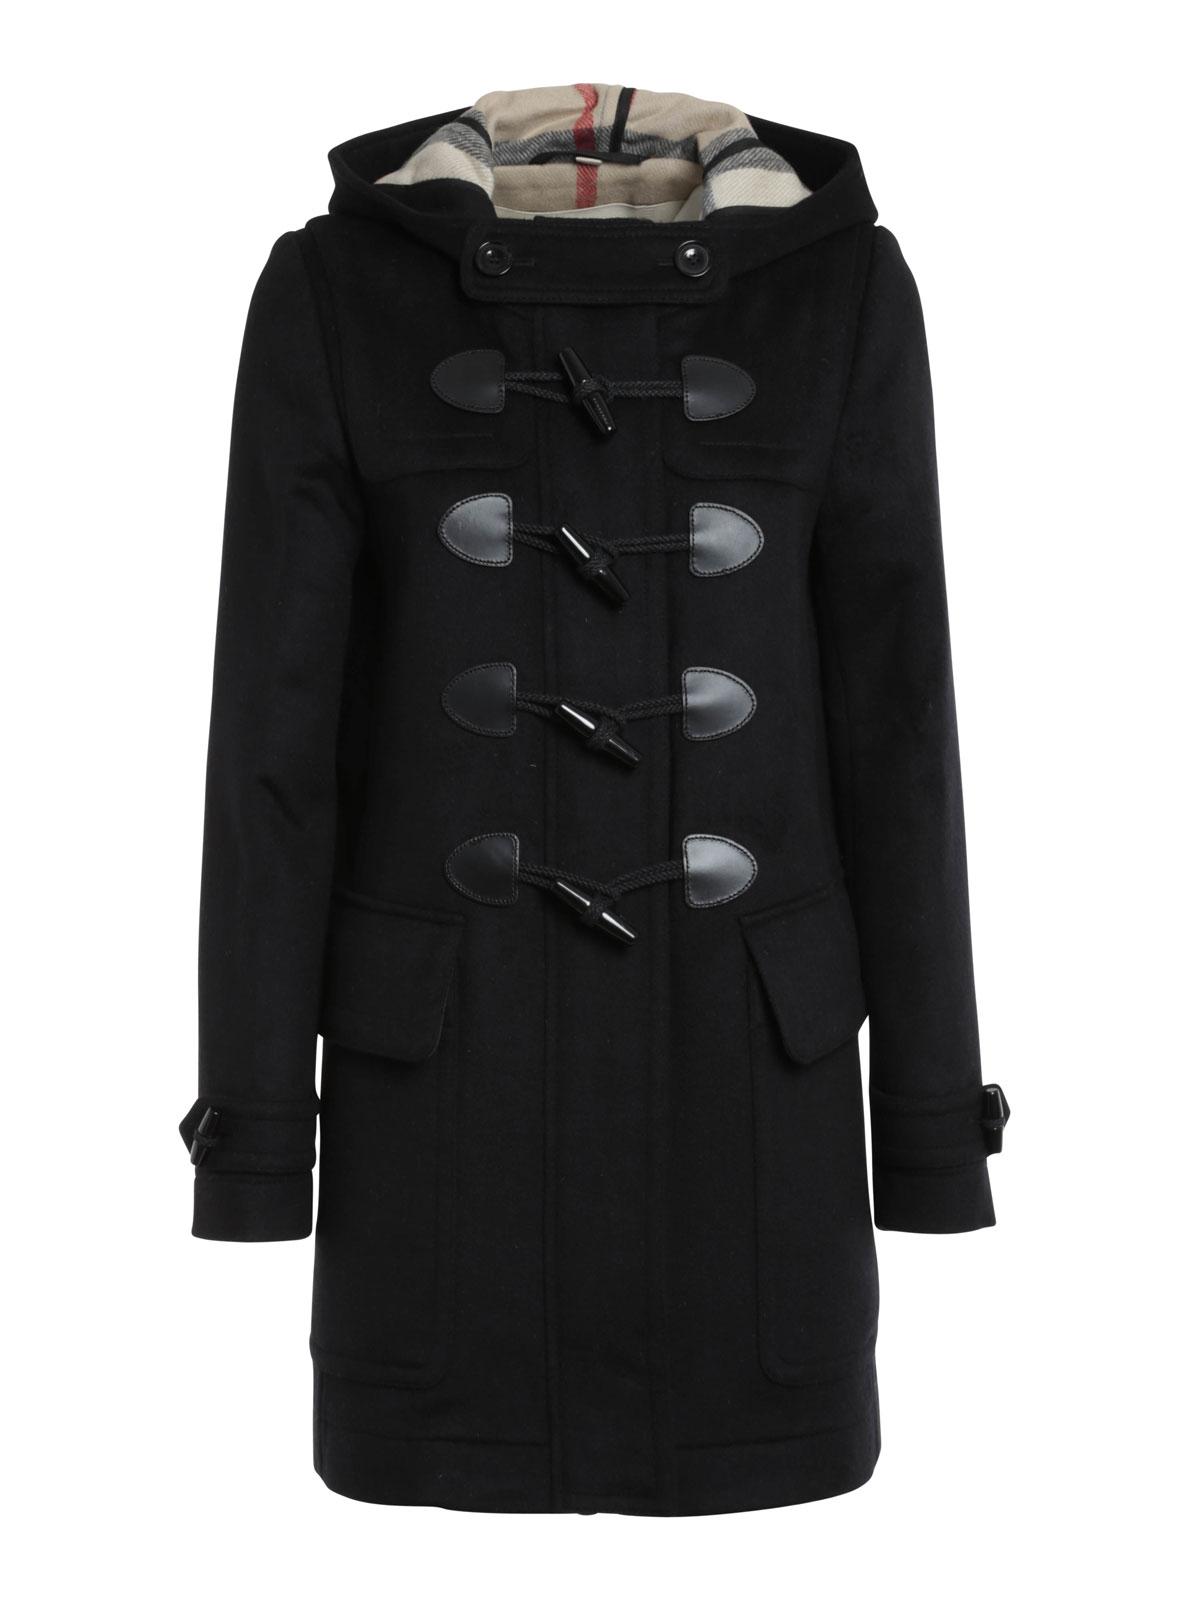 Burberry duffle coat women